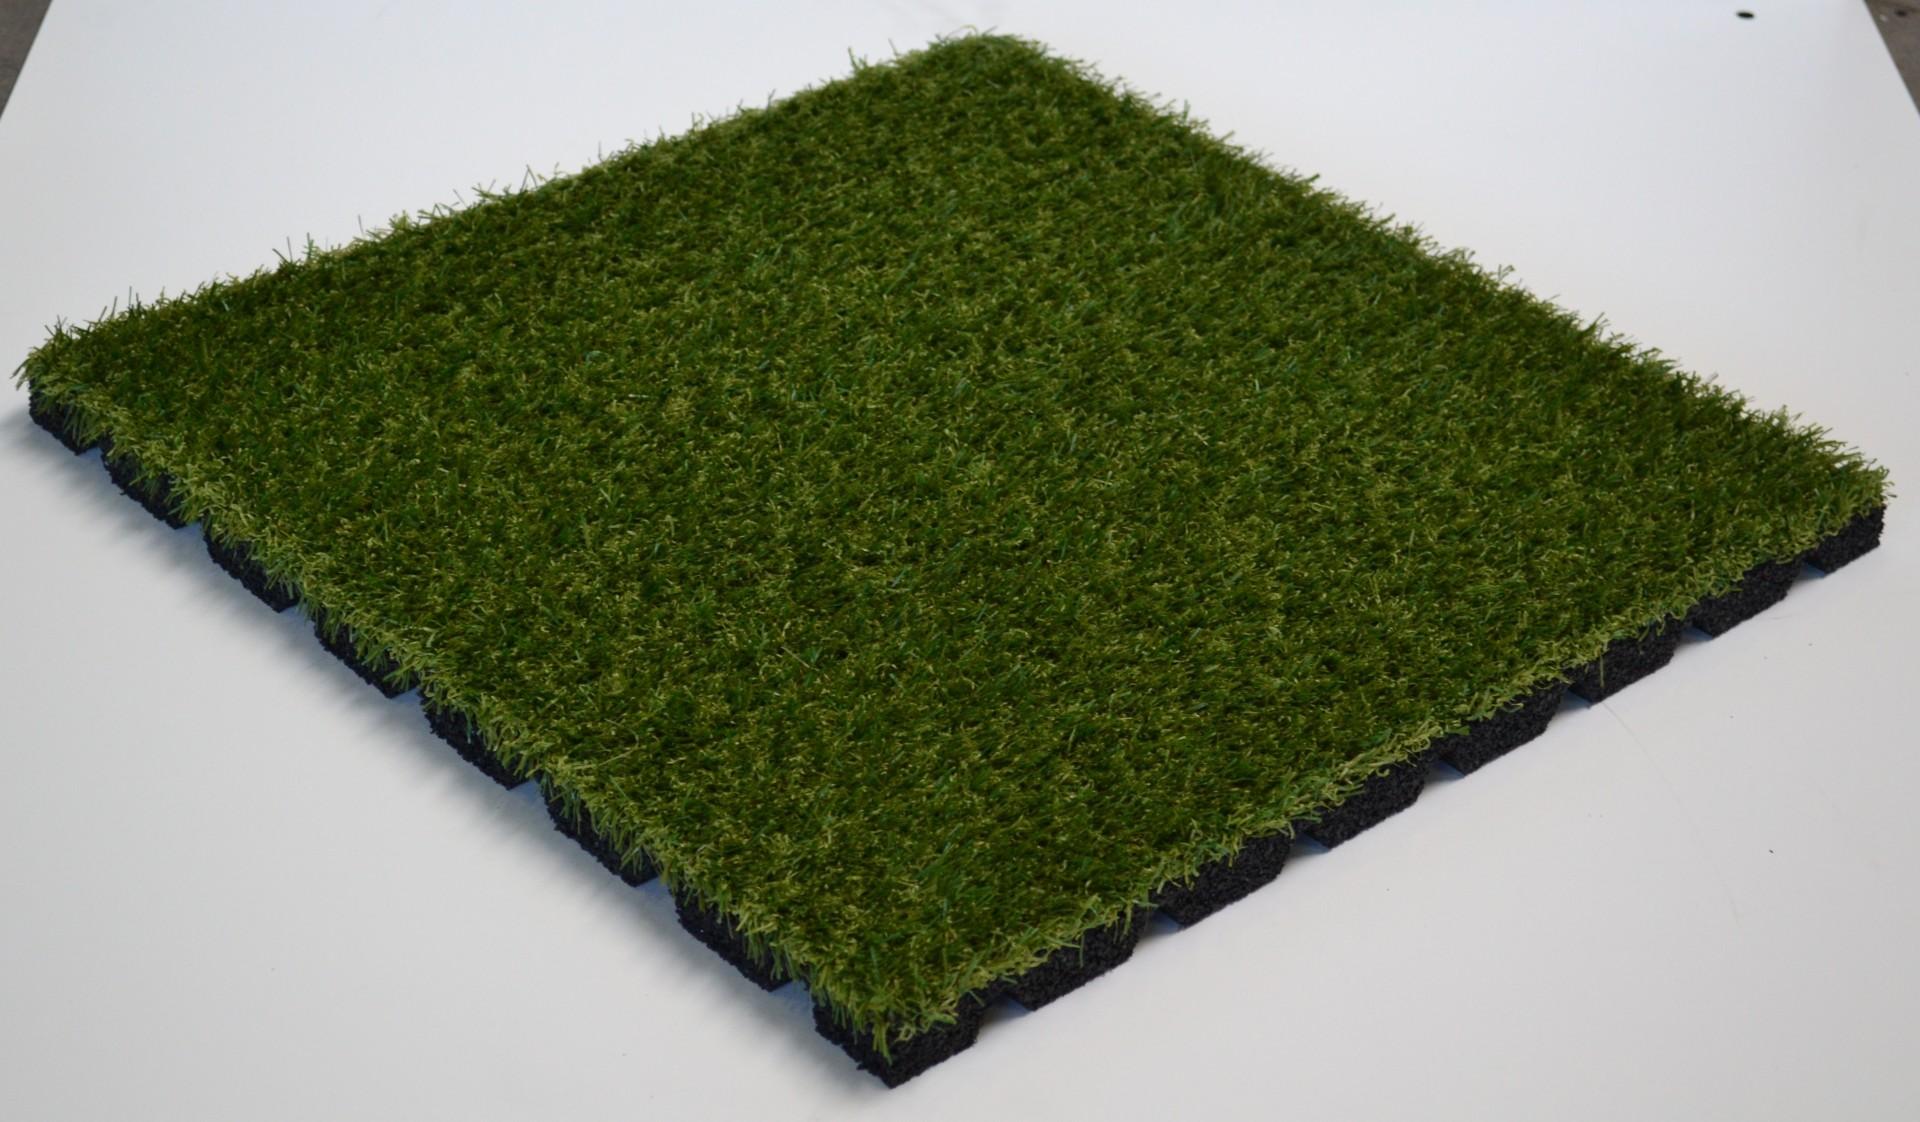 Luxury astro turf carpet home depot insured by ross for Grass carpet tiles